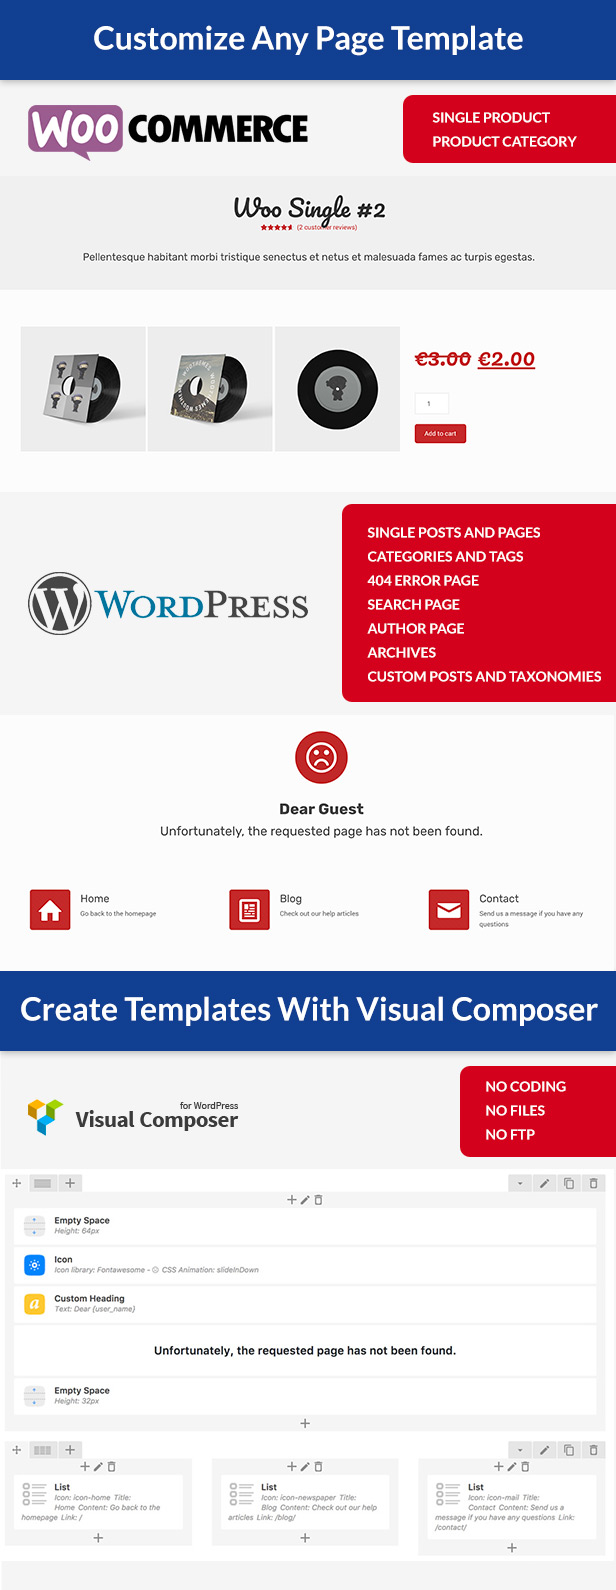 Custom Page Templates: New Way of Creating Custom Templates in WordPress - 3